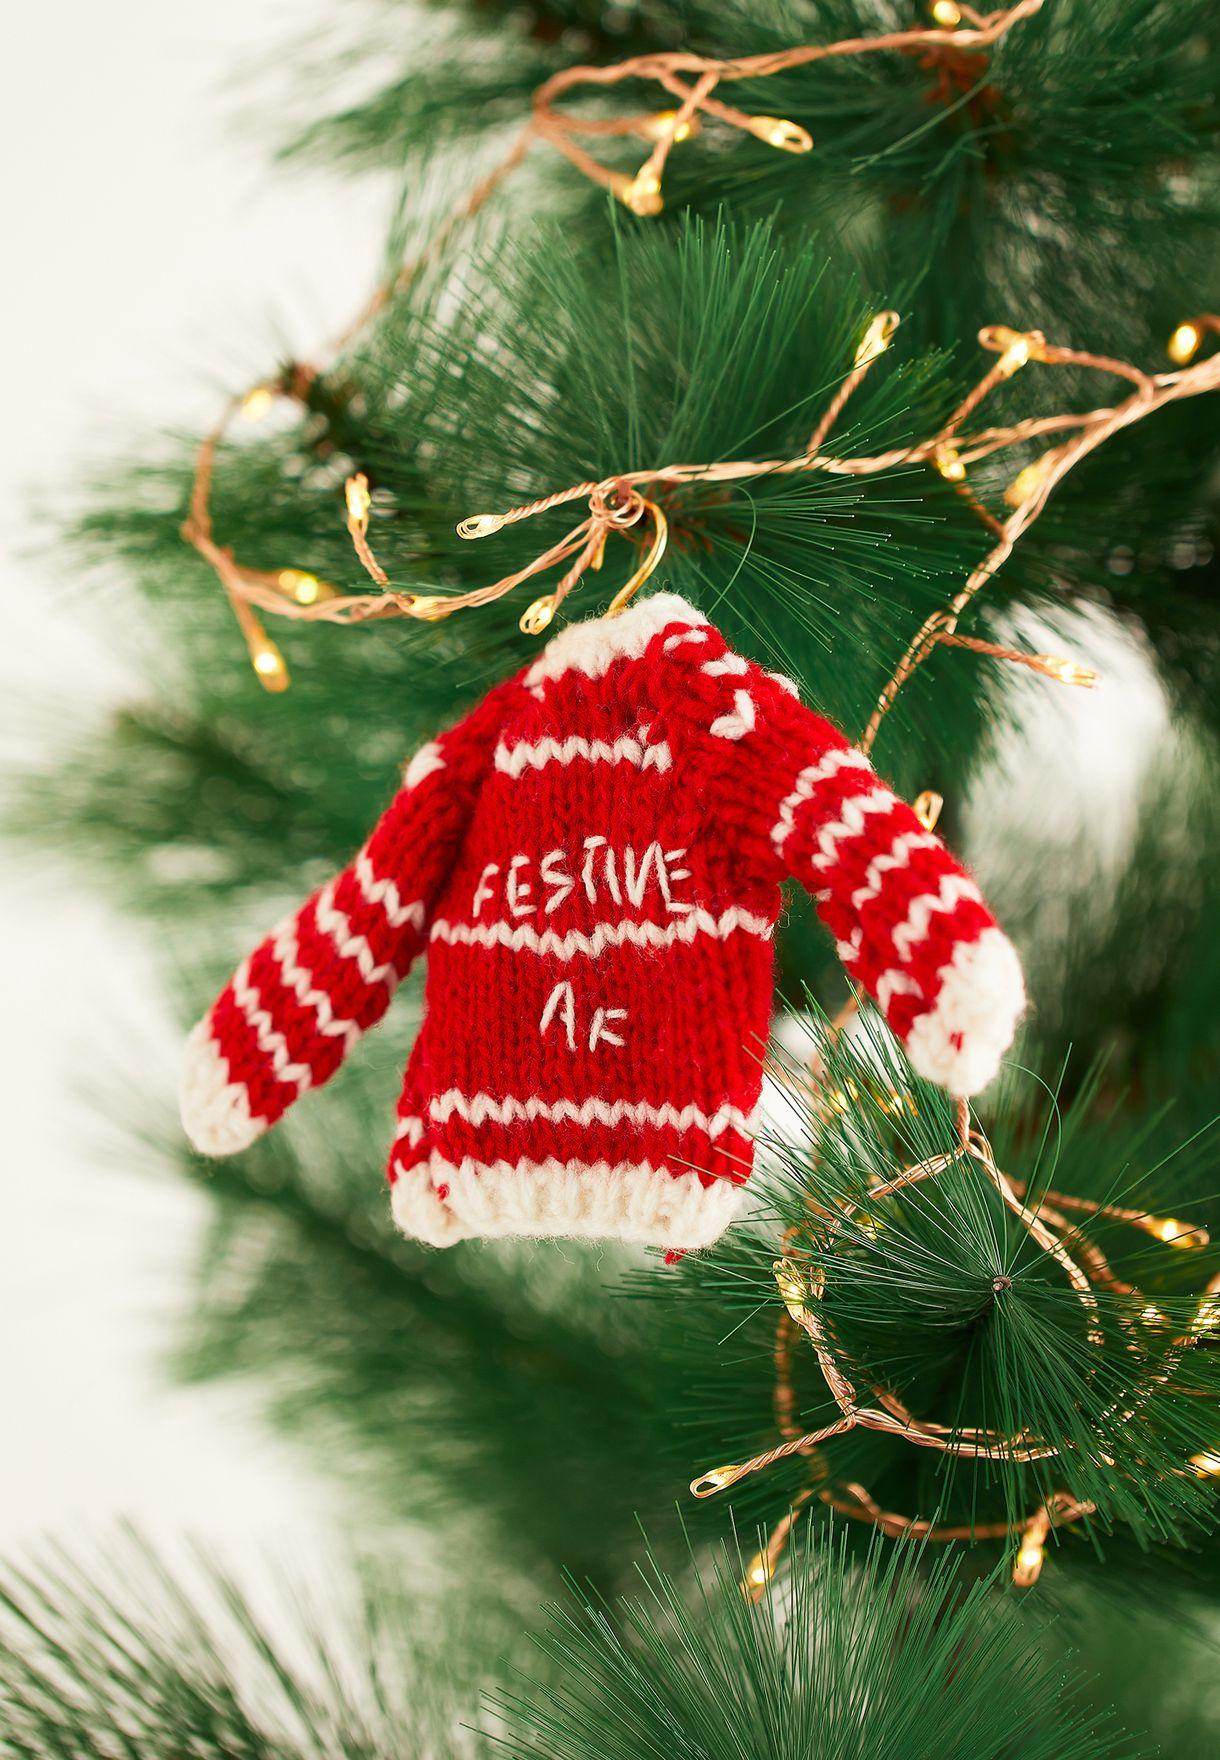 Christmas Festive Sweater Bauble